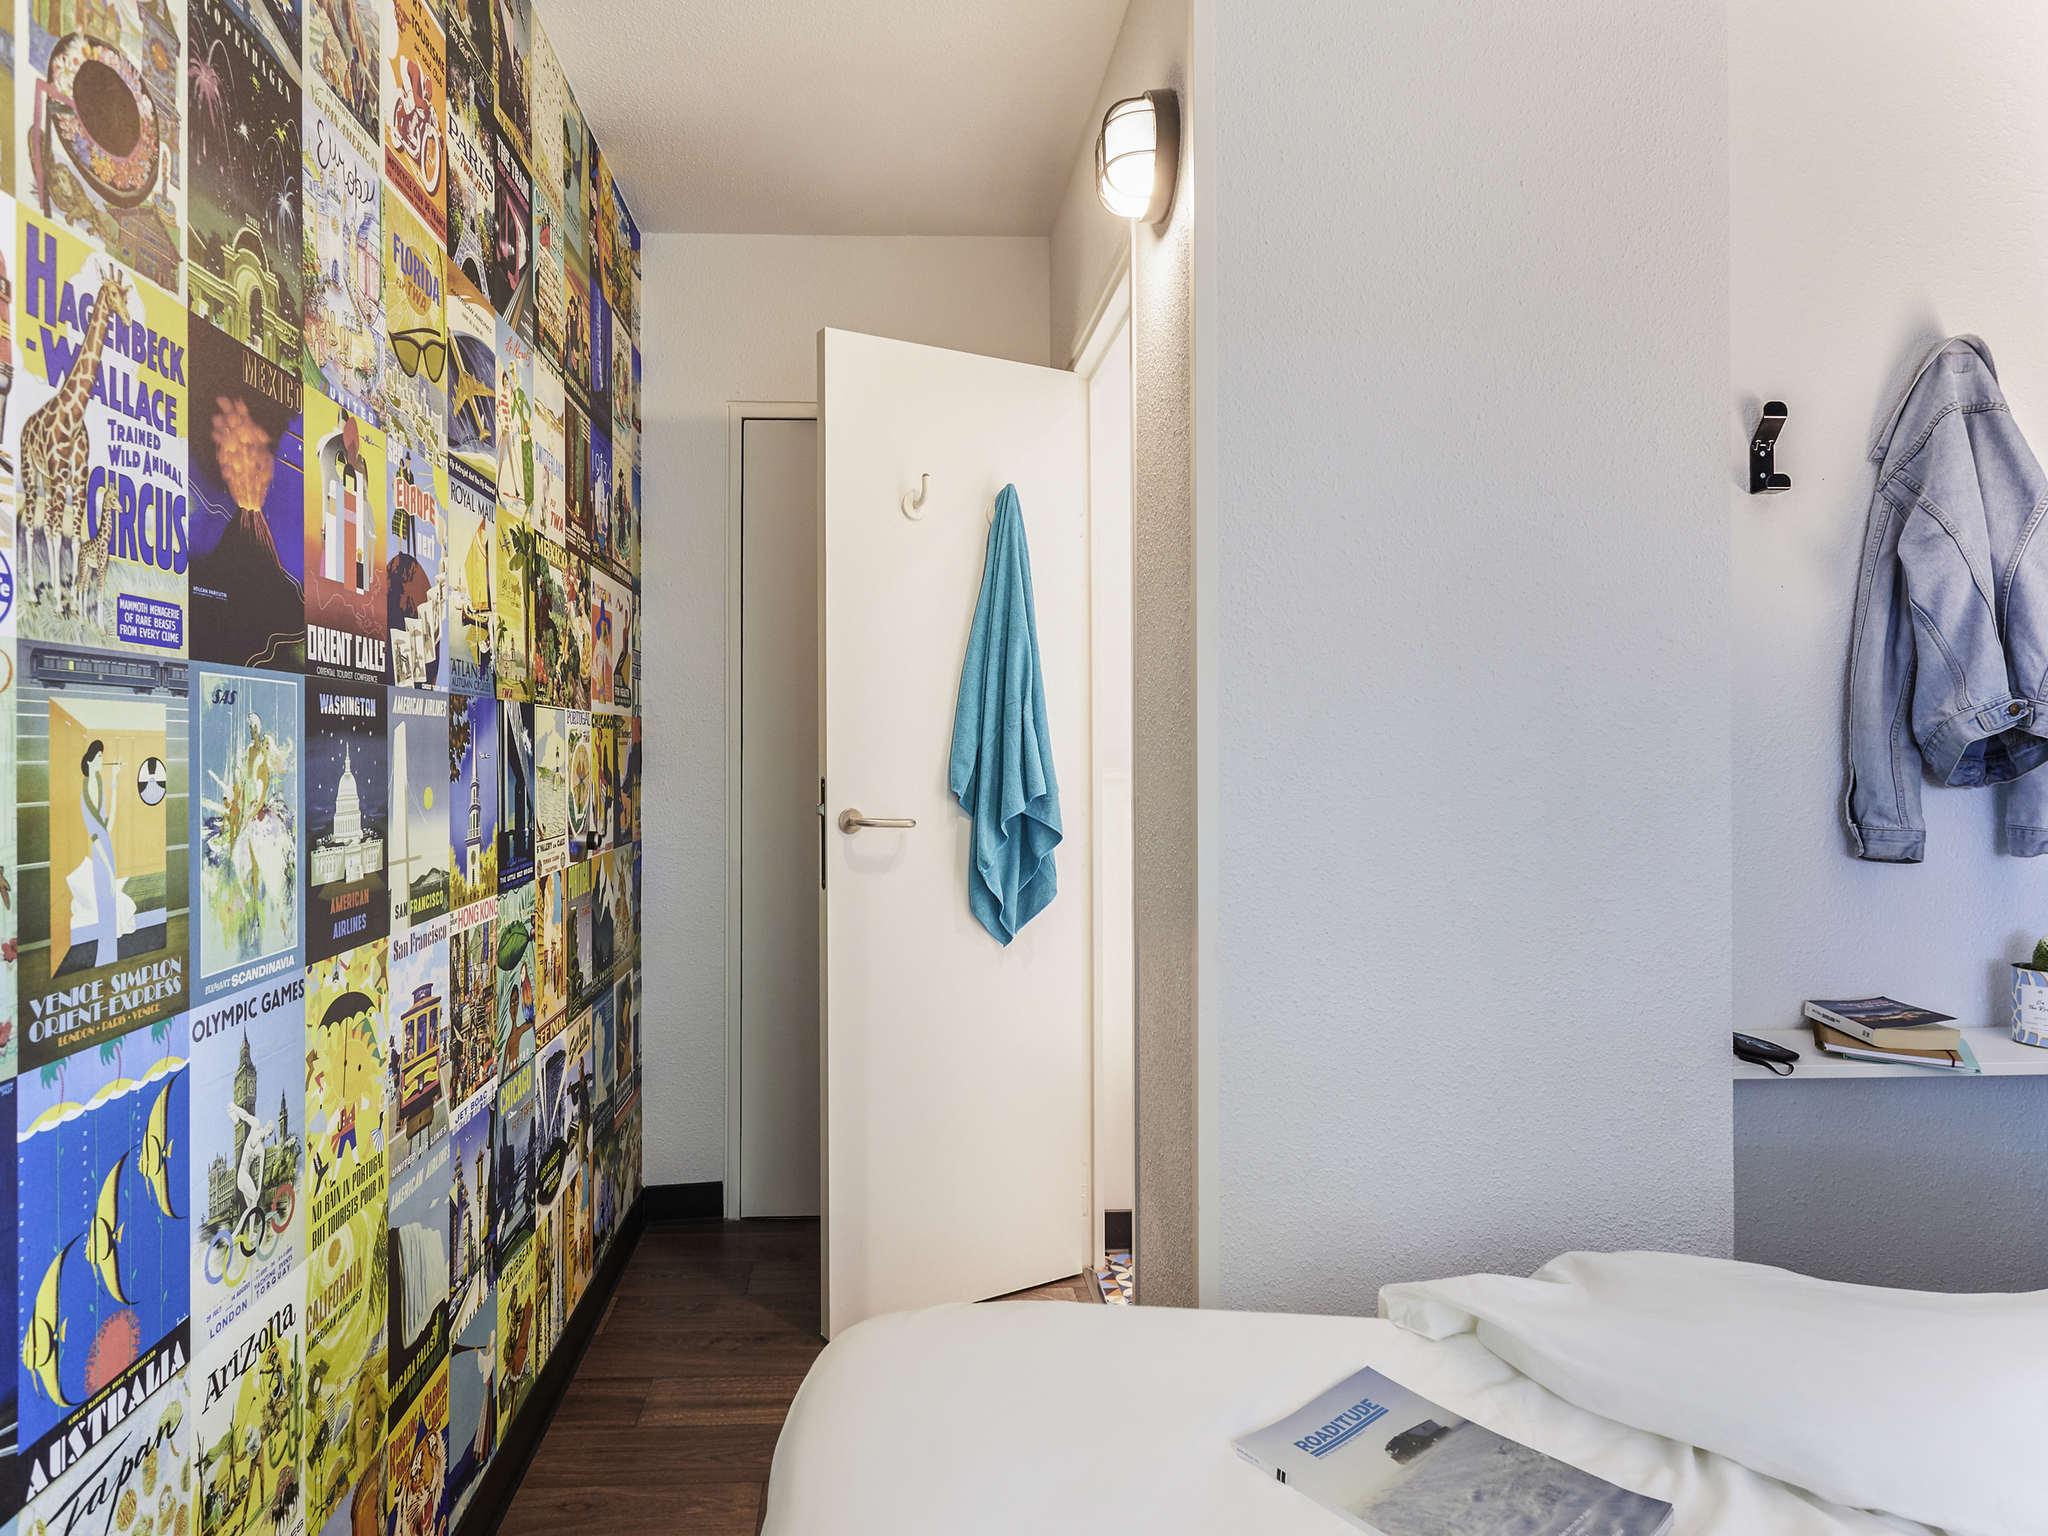 ホテル – hotelF1 Mulhouse Bâle Aéroport